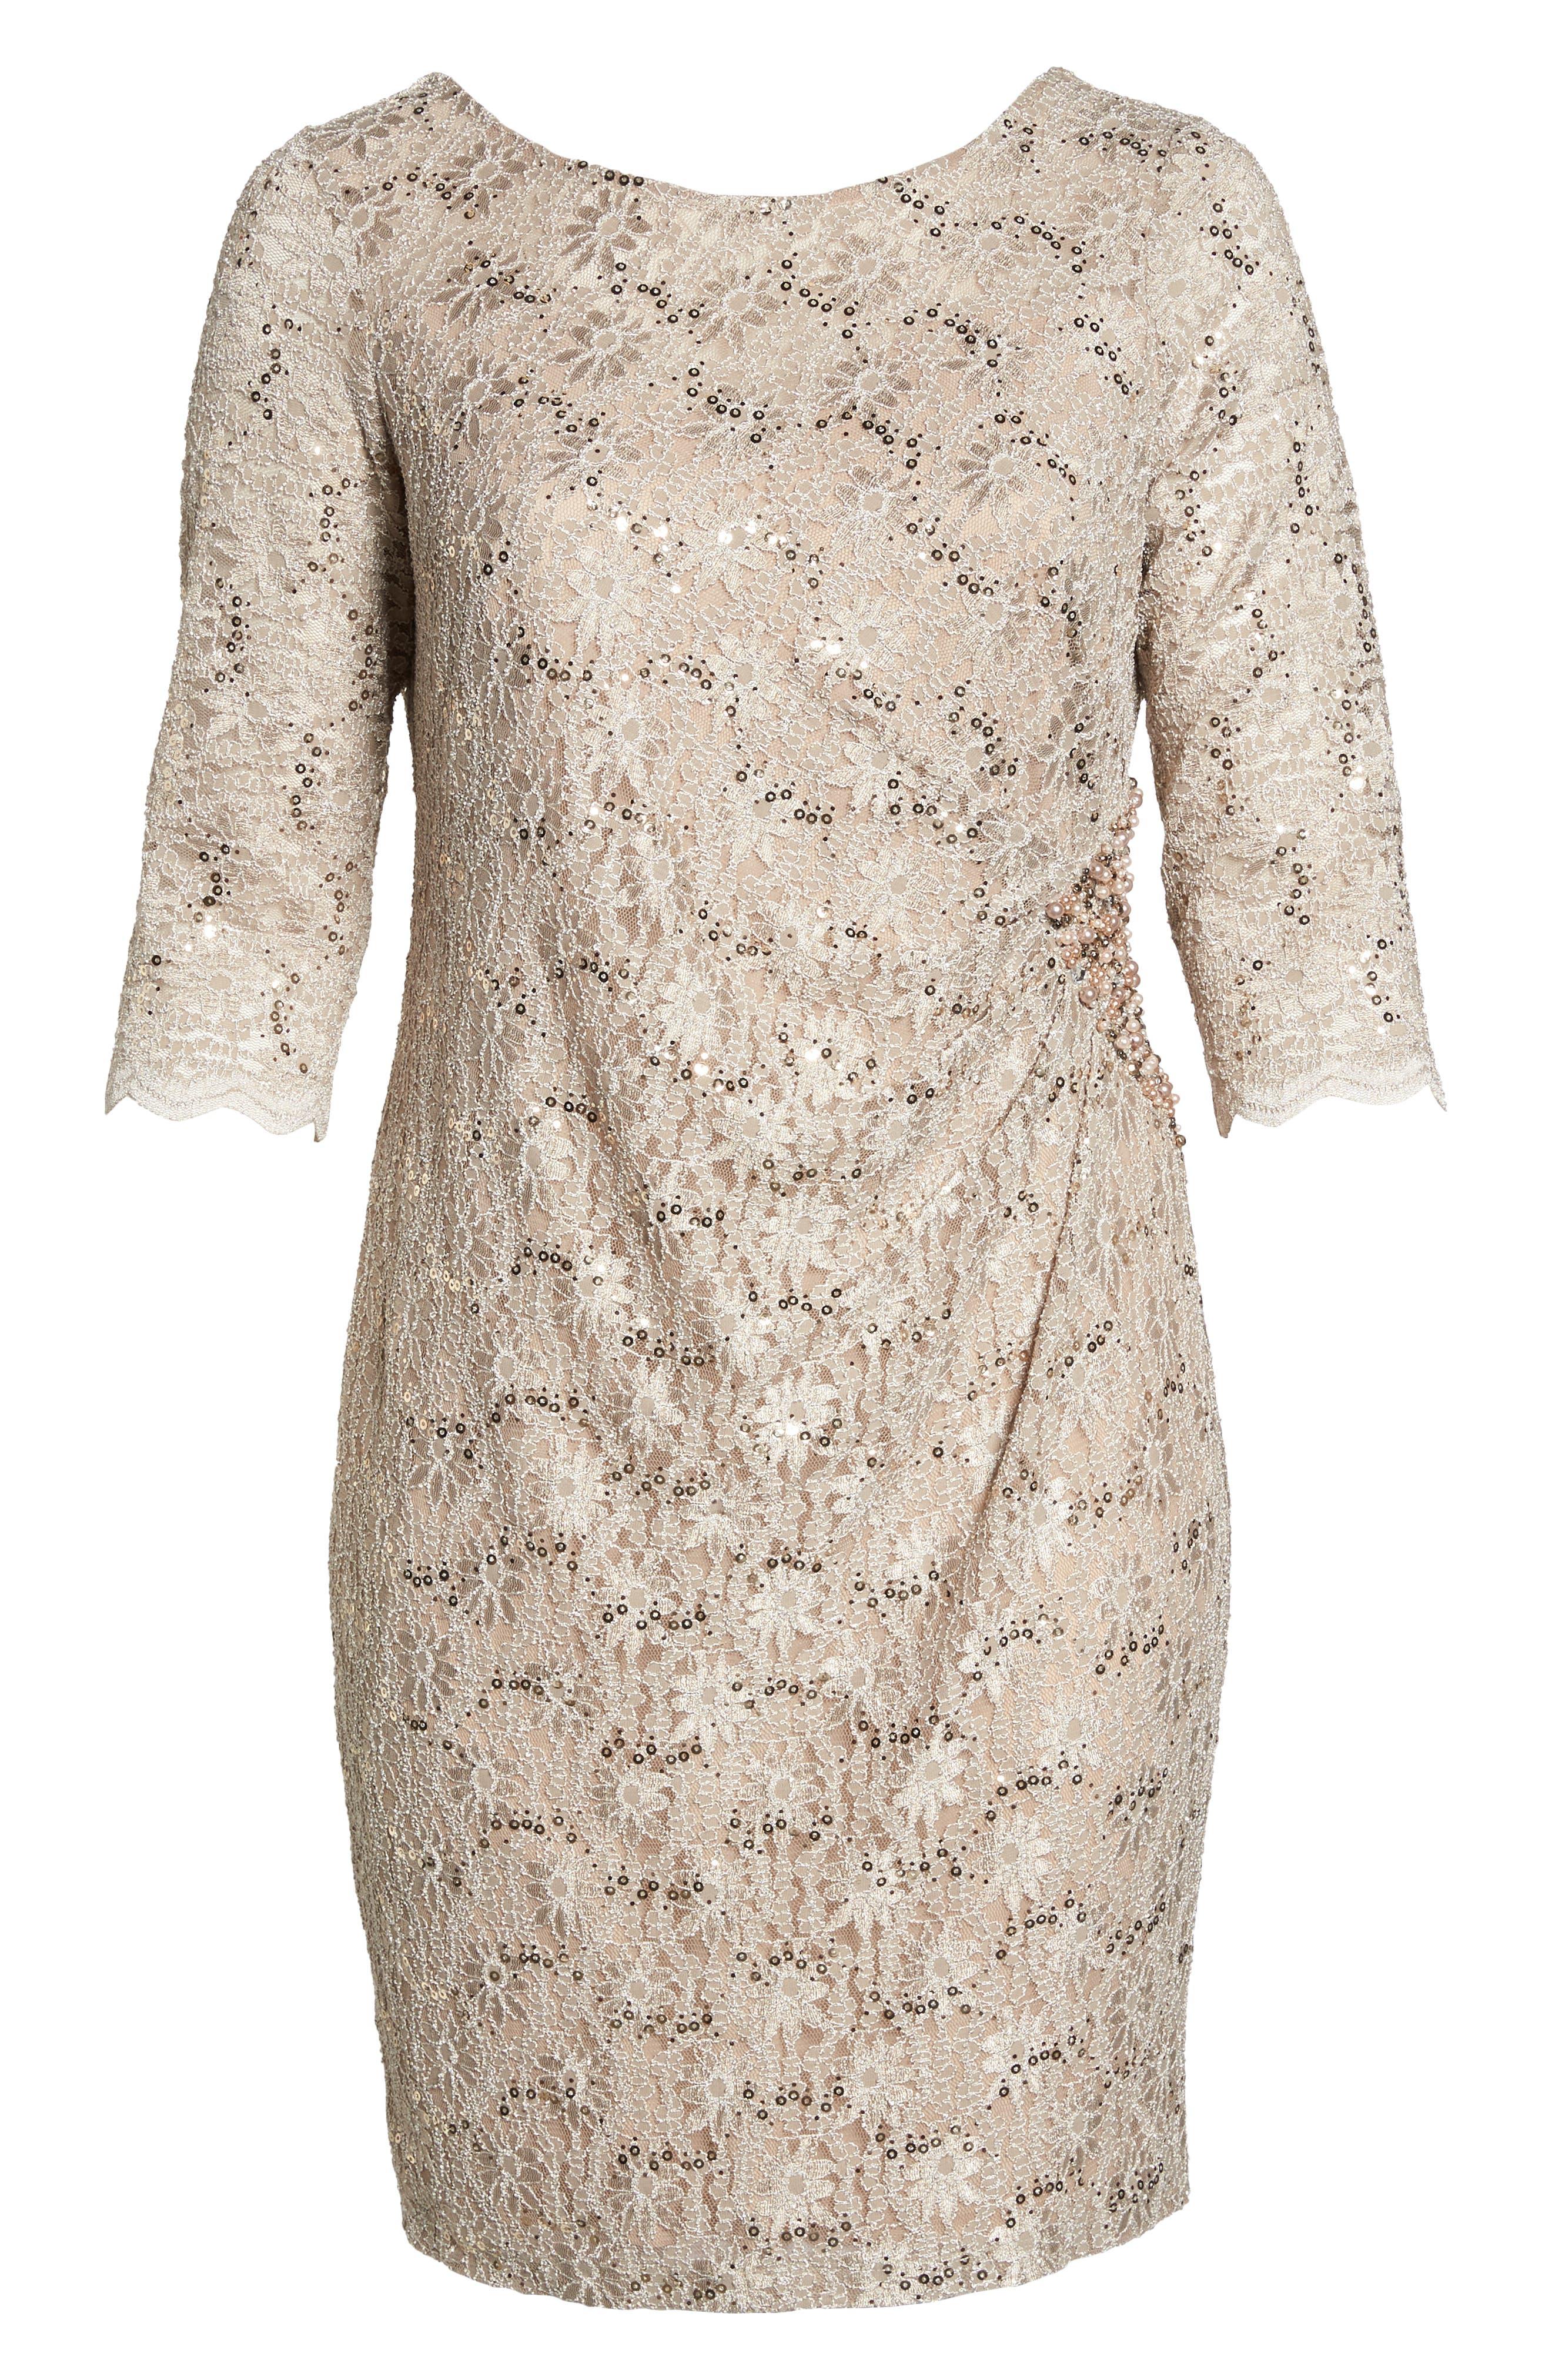 Embellished Illusion Lace Shift Dress,                             Alternate thumbnail 7, color,                             250